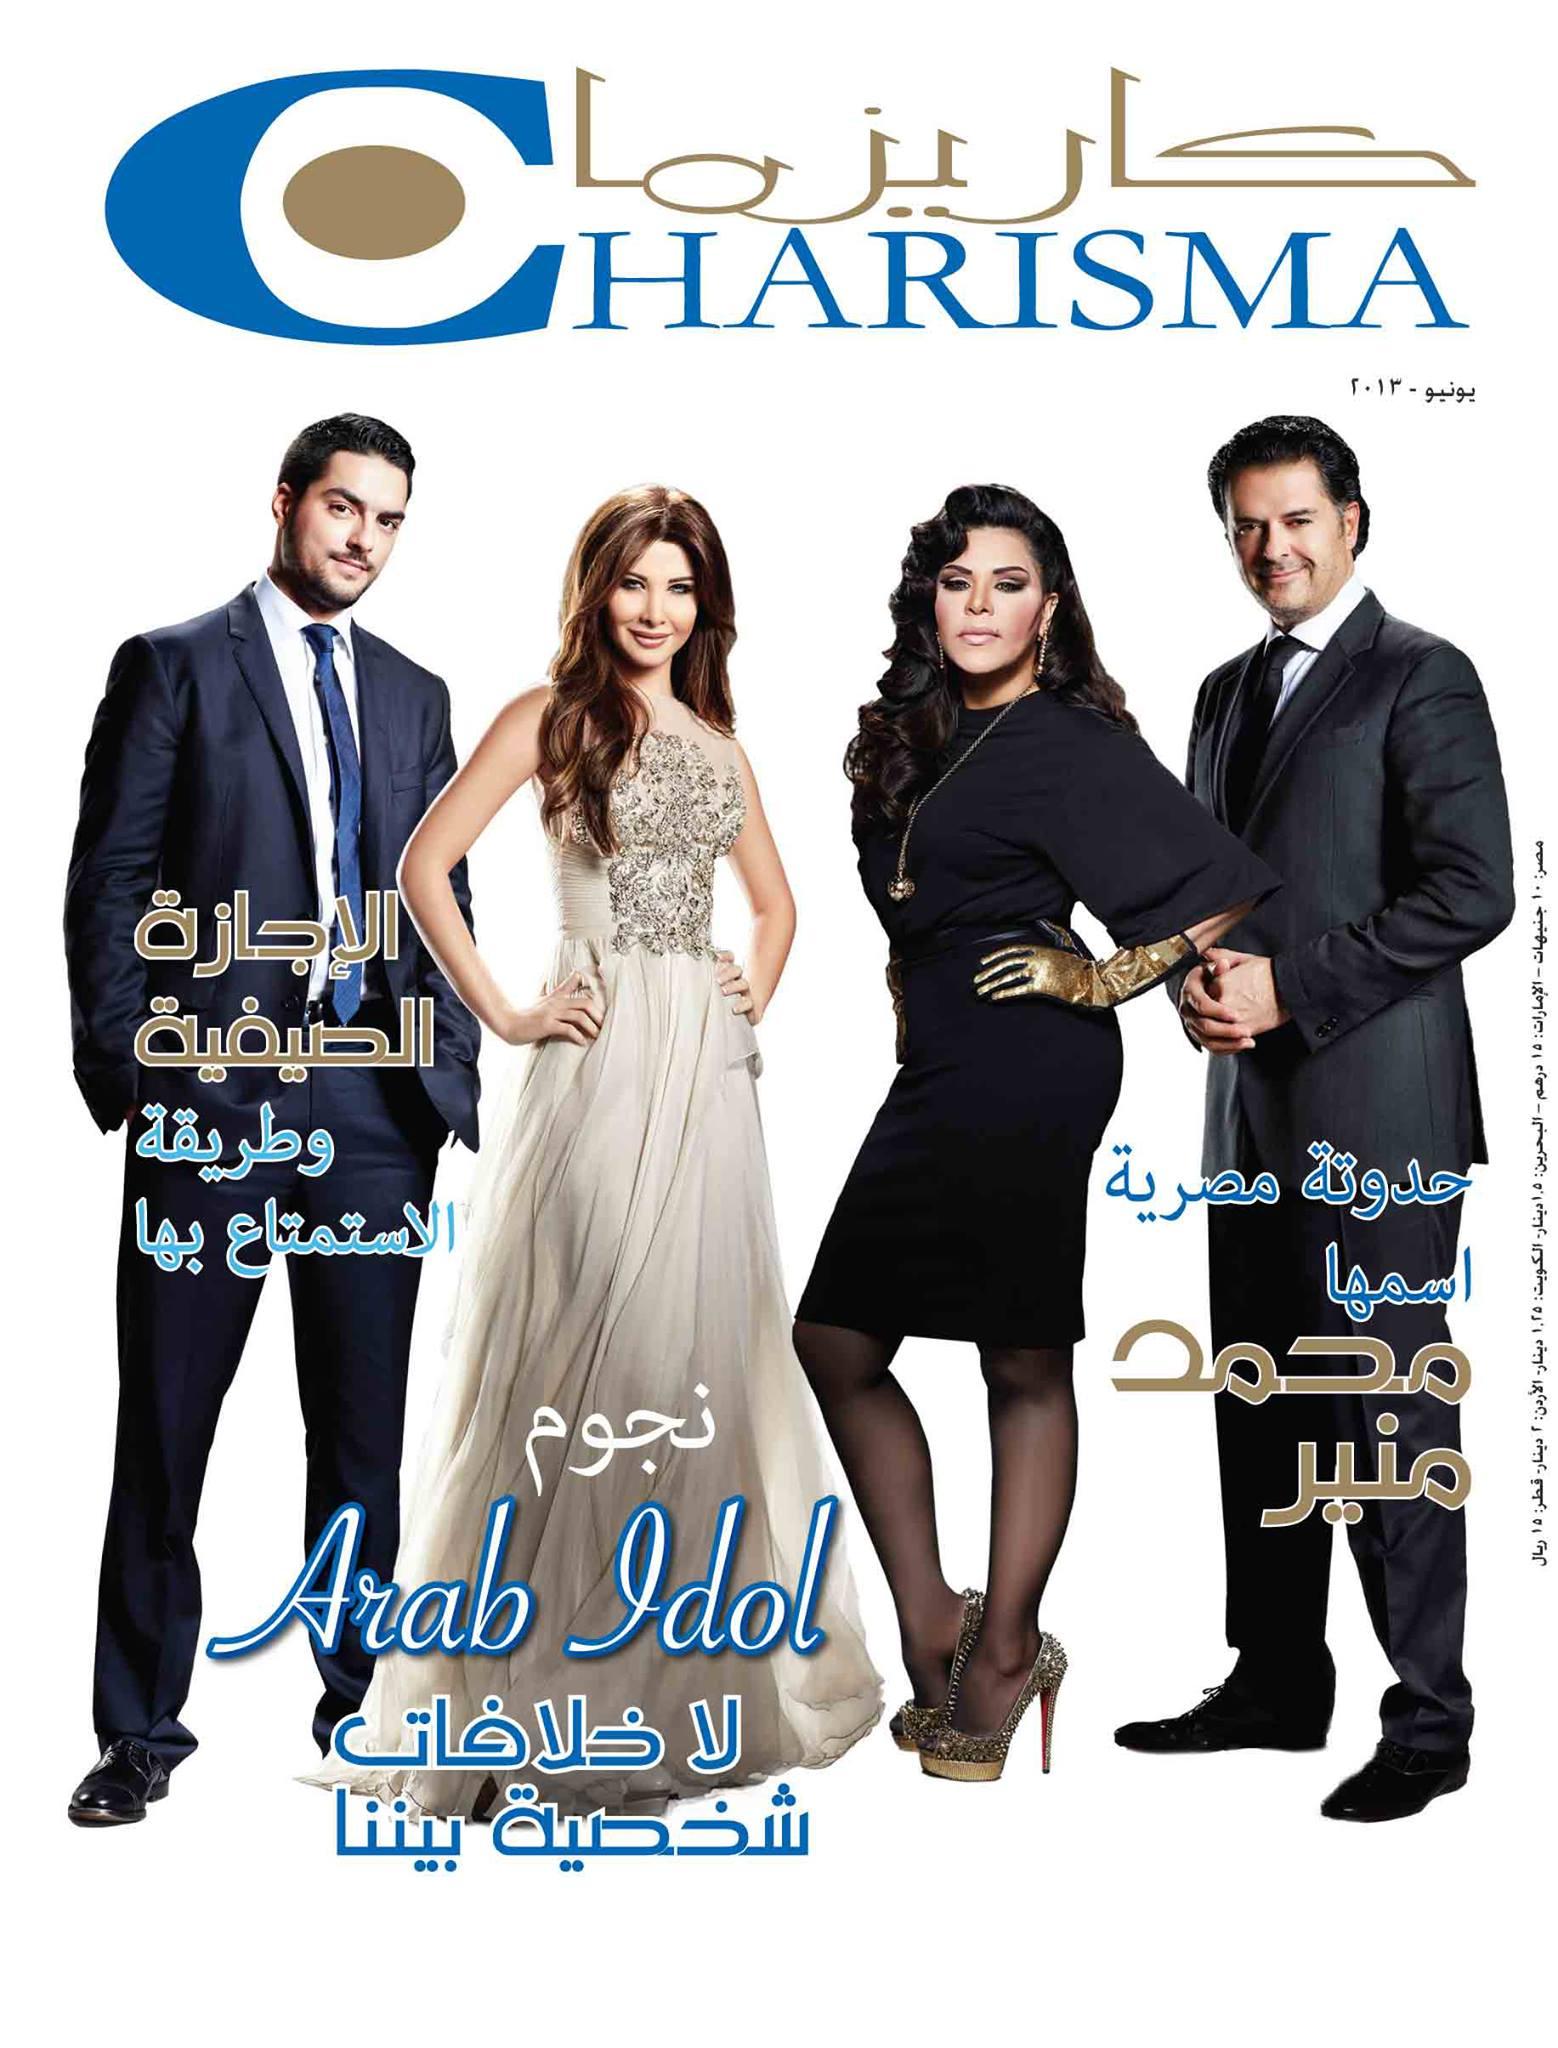 عکس نانسی عجرم بر روی مجله ی کاریزما Nancy On the Cover Of Charisma Magazine - June 2013